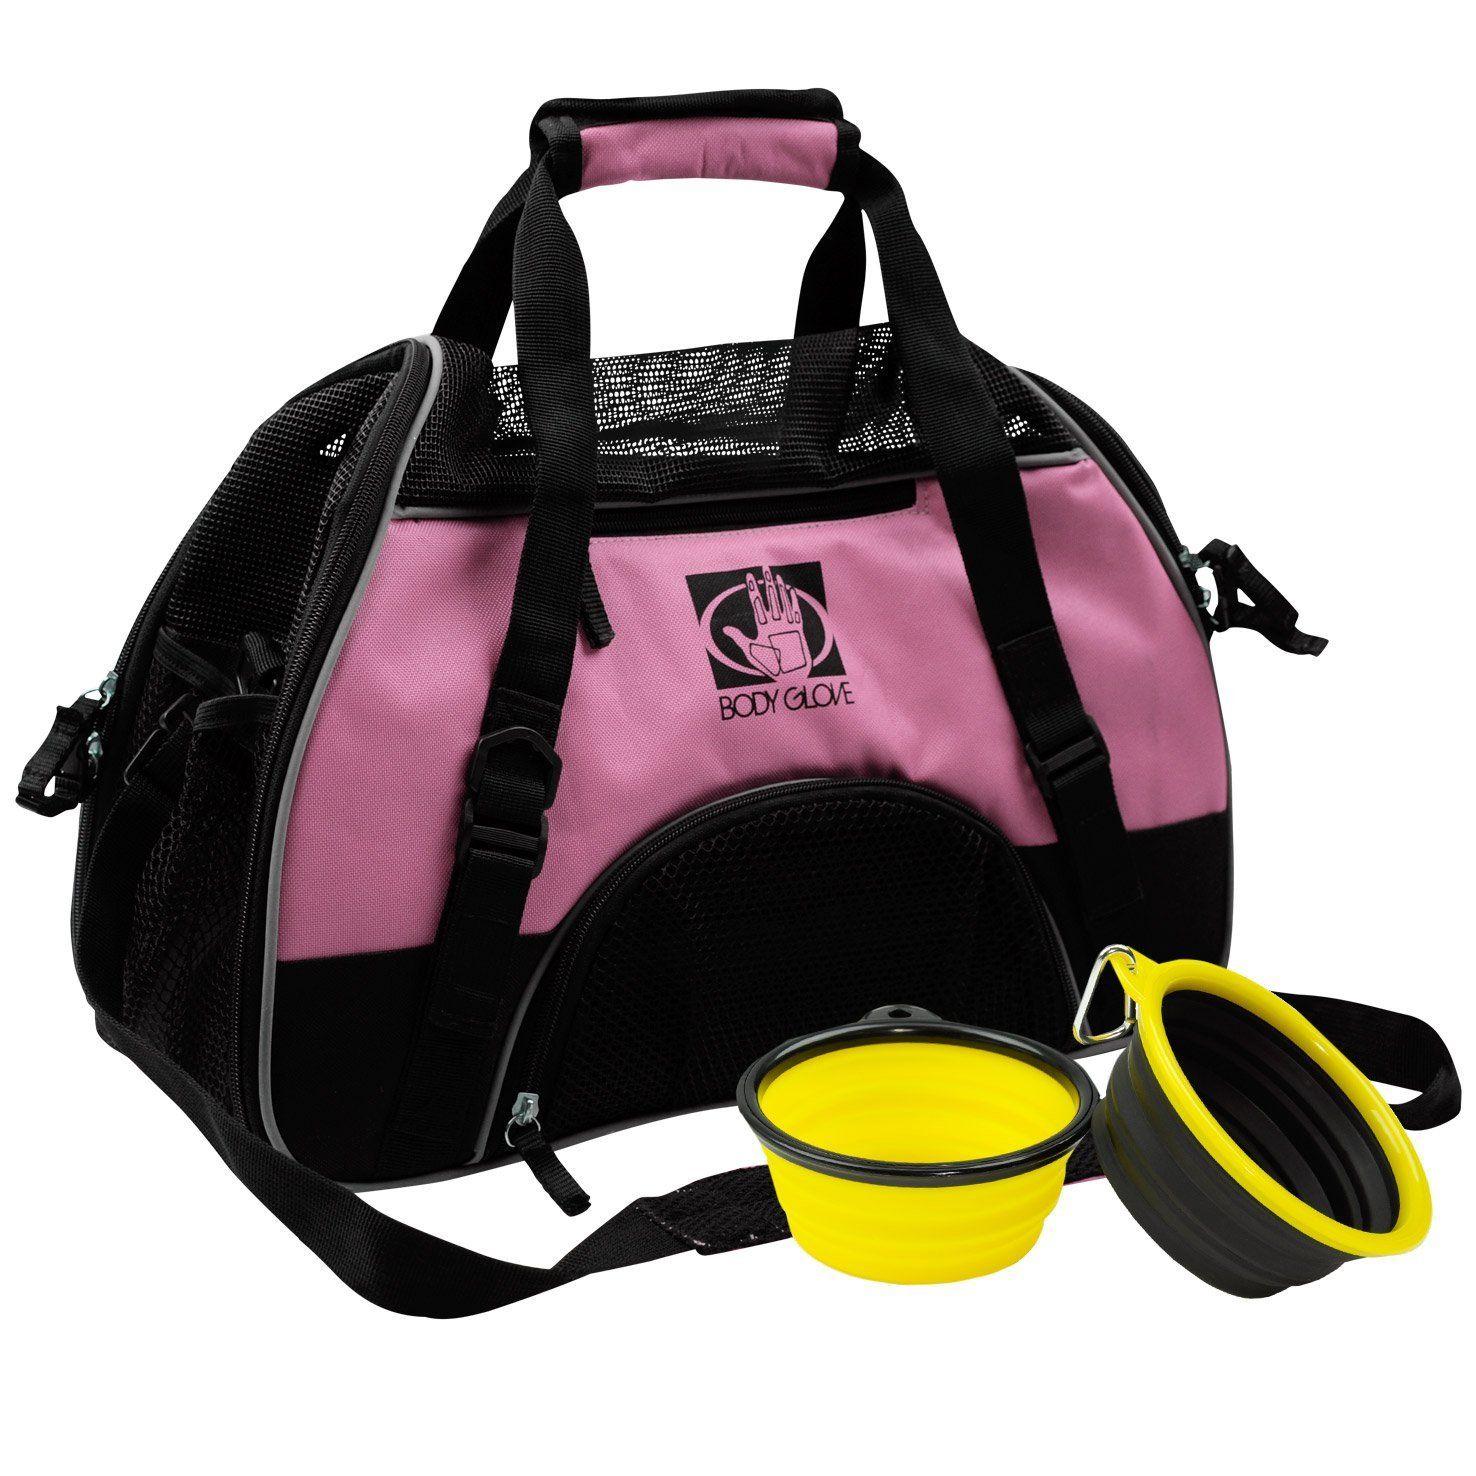 Body Glove Pet Carrier With 2 Bowls And Fleece Mat, Black